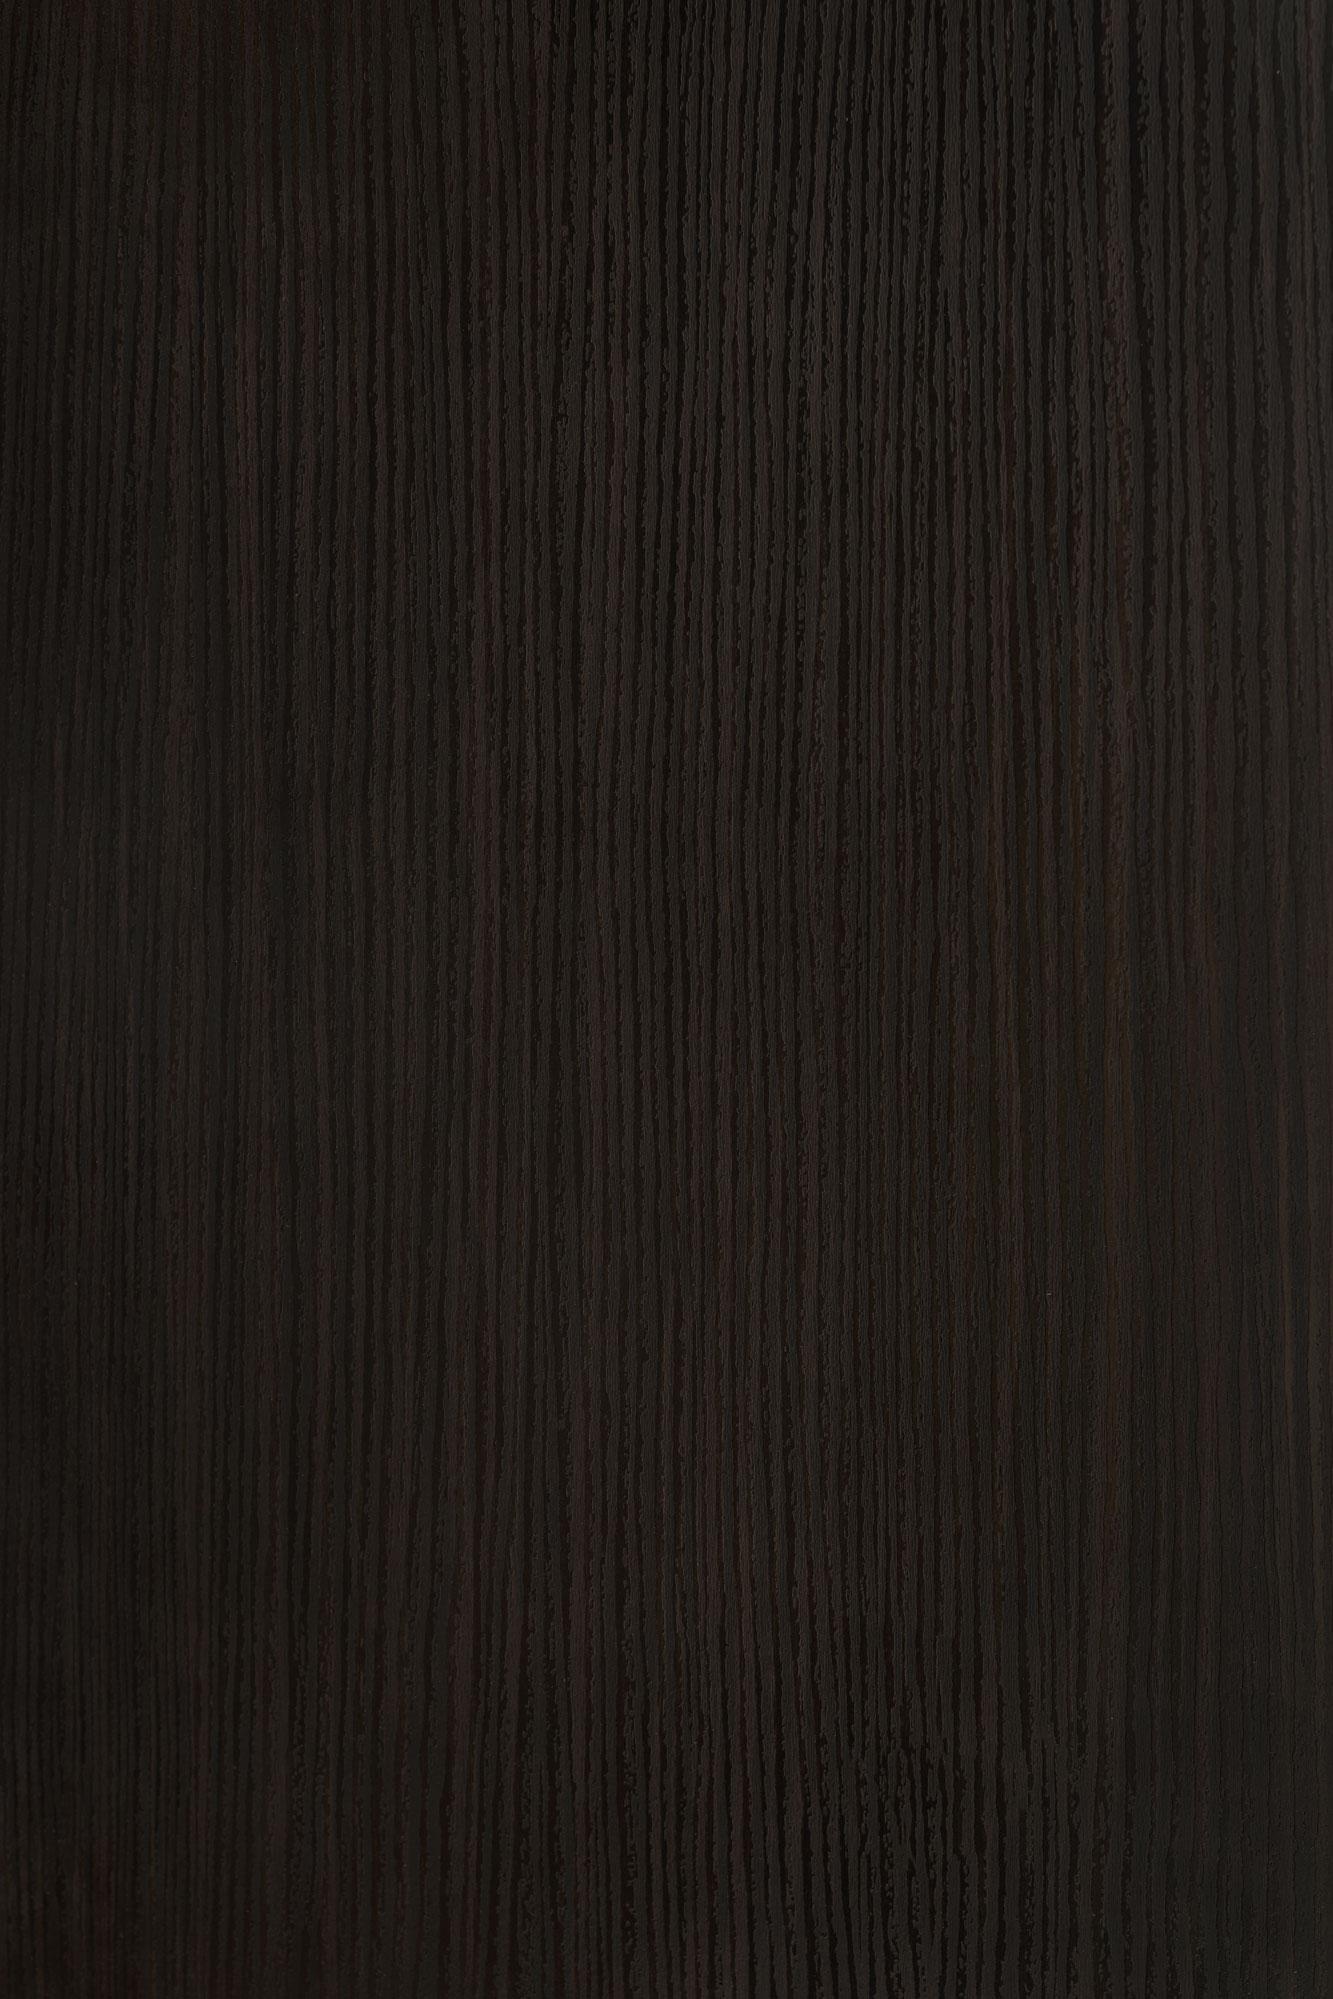 2222 RU Сантос тёмно-коричневый